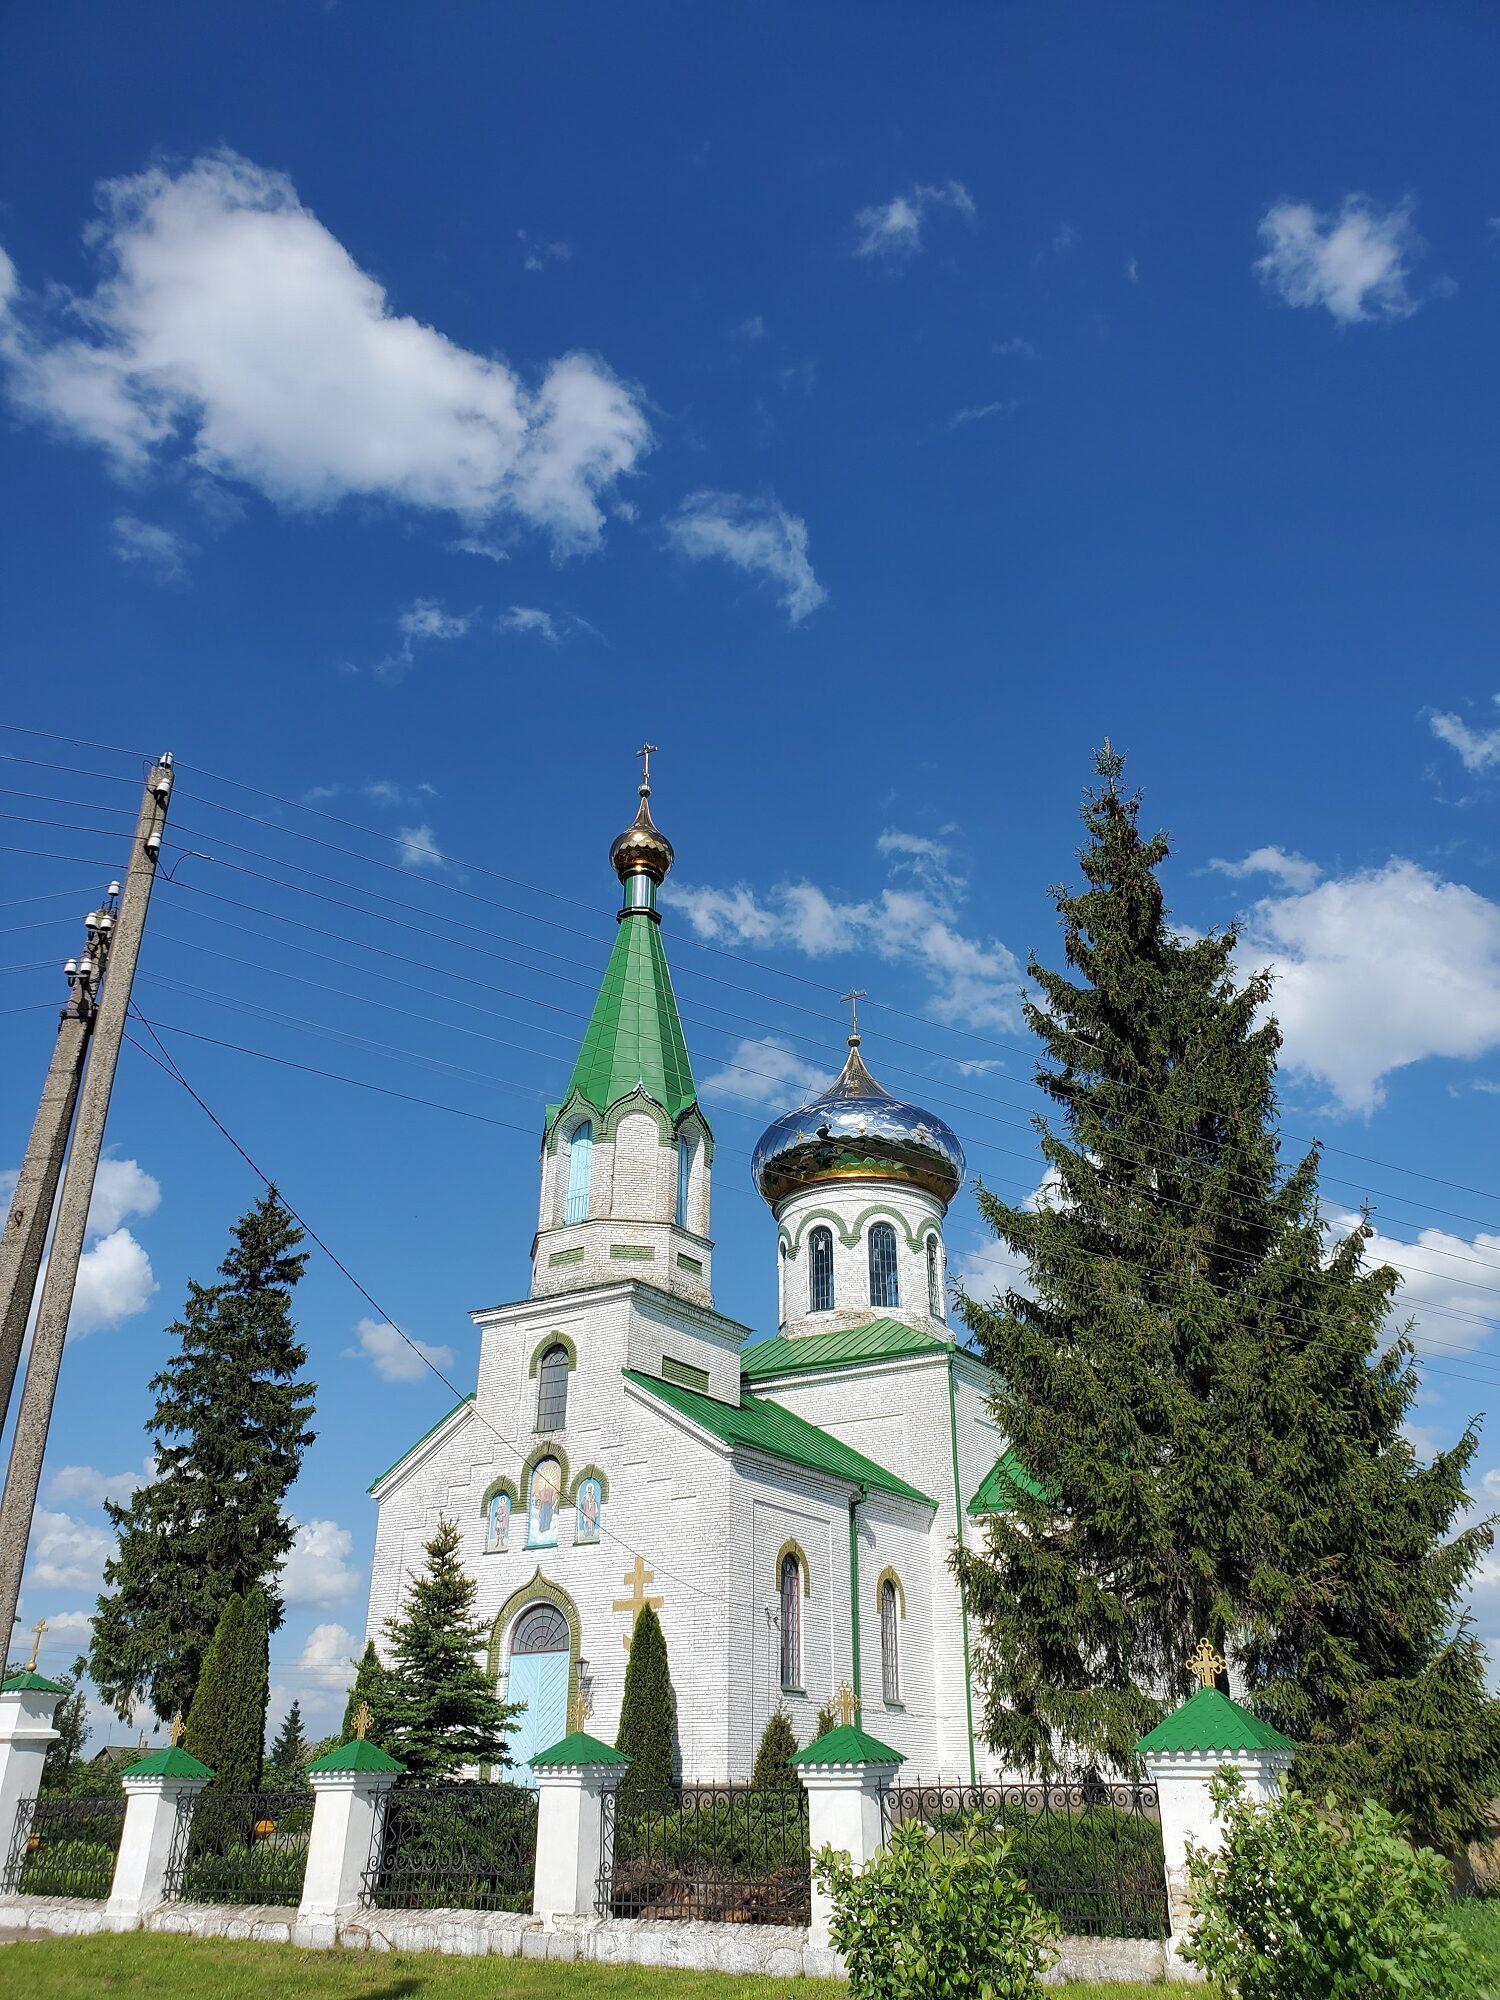 20200606 163507 rotated - Церковь Святого Георгия Победоносца в Ситцах